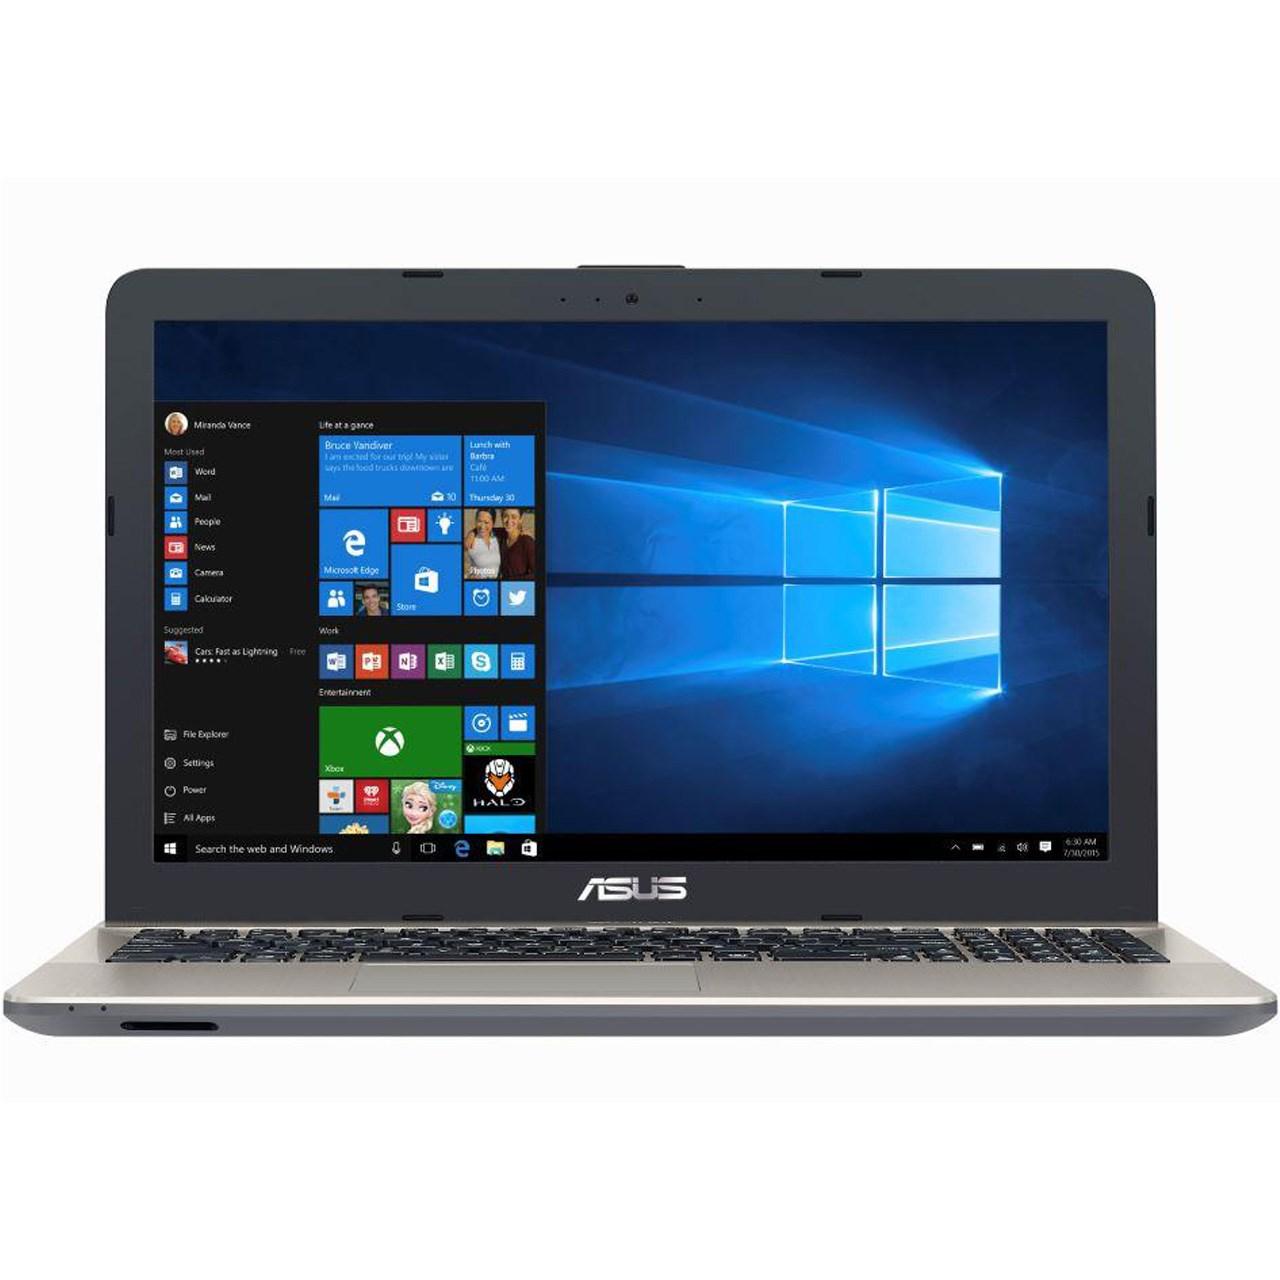 لپ تاپ 15 اینچی ایسوس مدل VivoBook X541NA - D